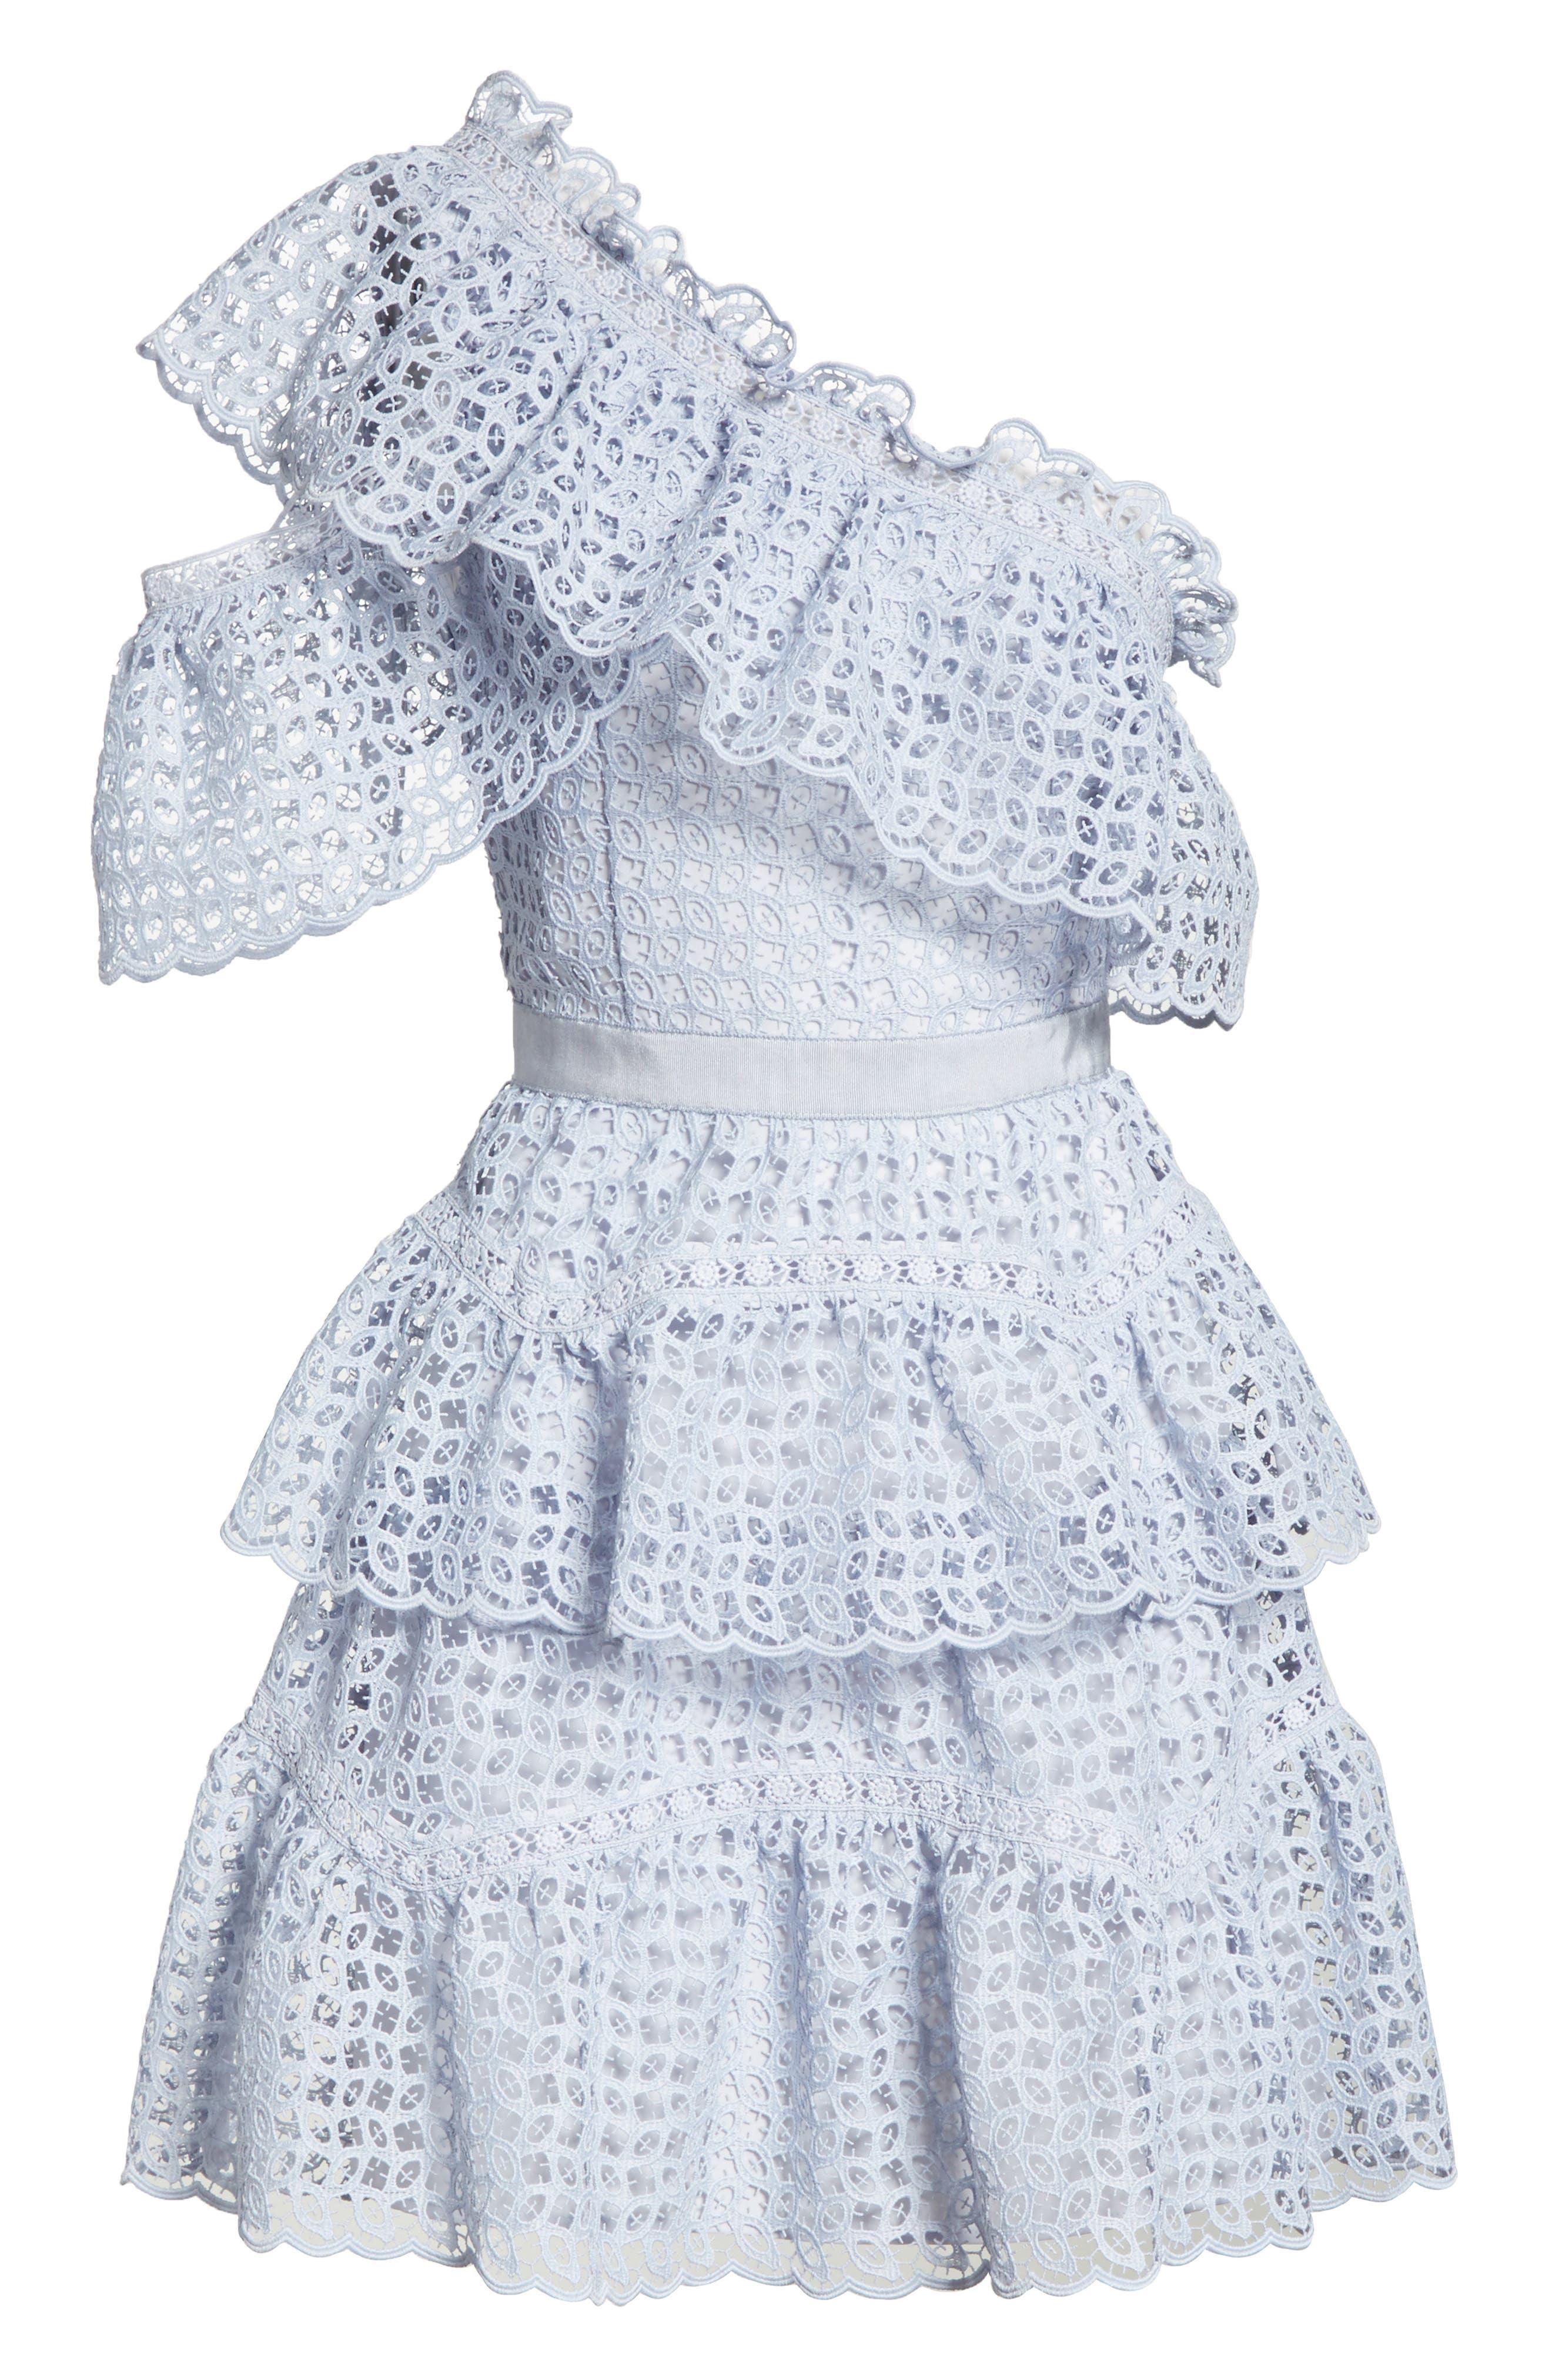 One-Shoulder Cutwork Organza Dress,                             Alternate thumbnail 6, color,                             Pale Blue